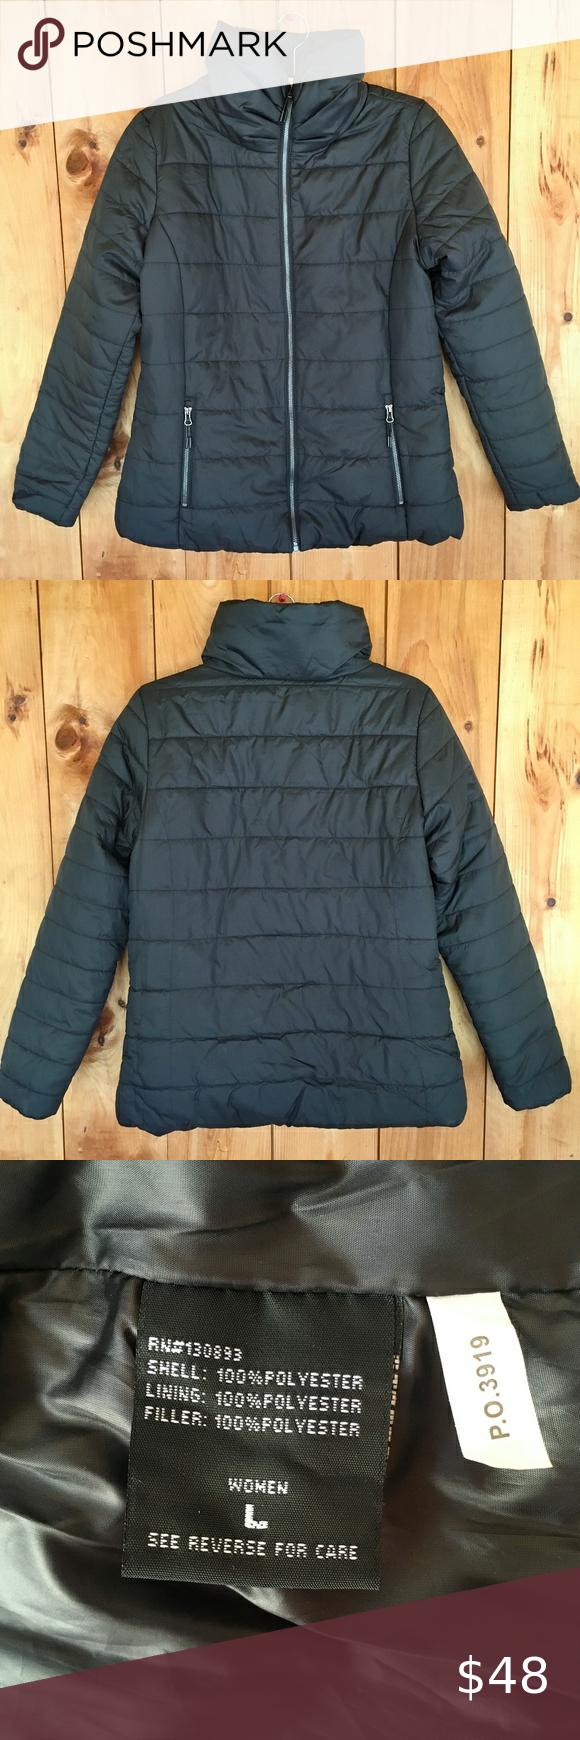 Nwot Stoic Puffer Jacket Puffer Jacket Women Clothes Design Jackets [ 1740 x 580 Pixel ]